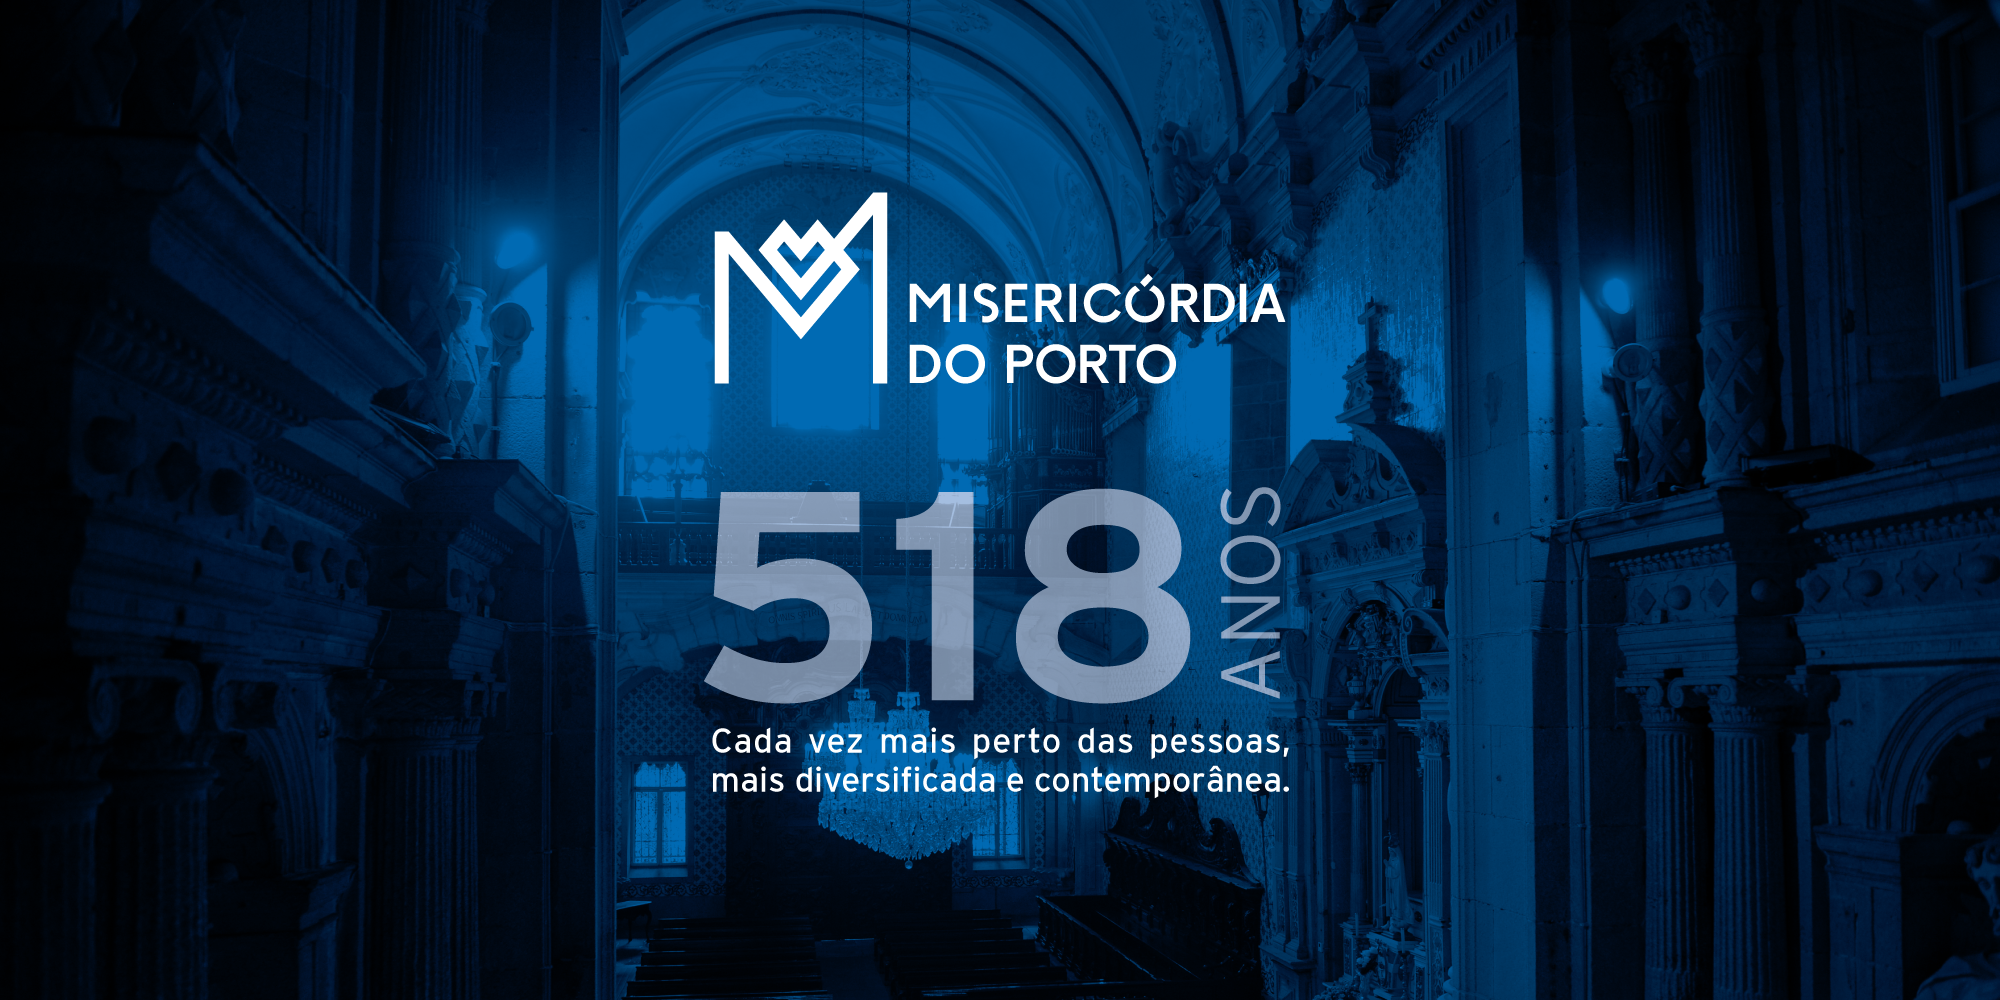 http://www.scmp.pt/assets/misc/img/Slideshow/2017/20170312%20SCMP%20518%20anos/MP-518aniversario-bannersite-v01.png